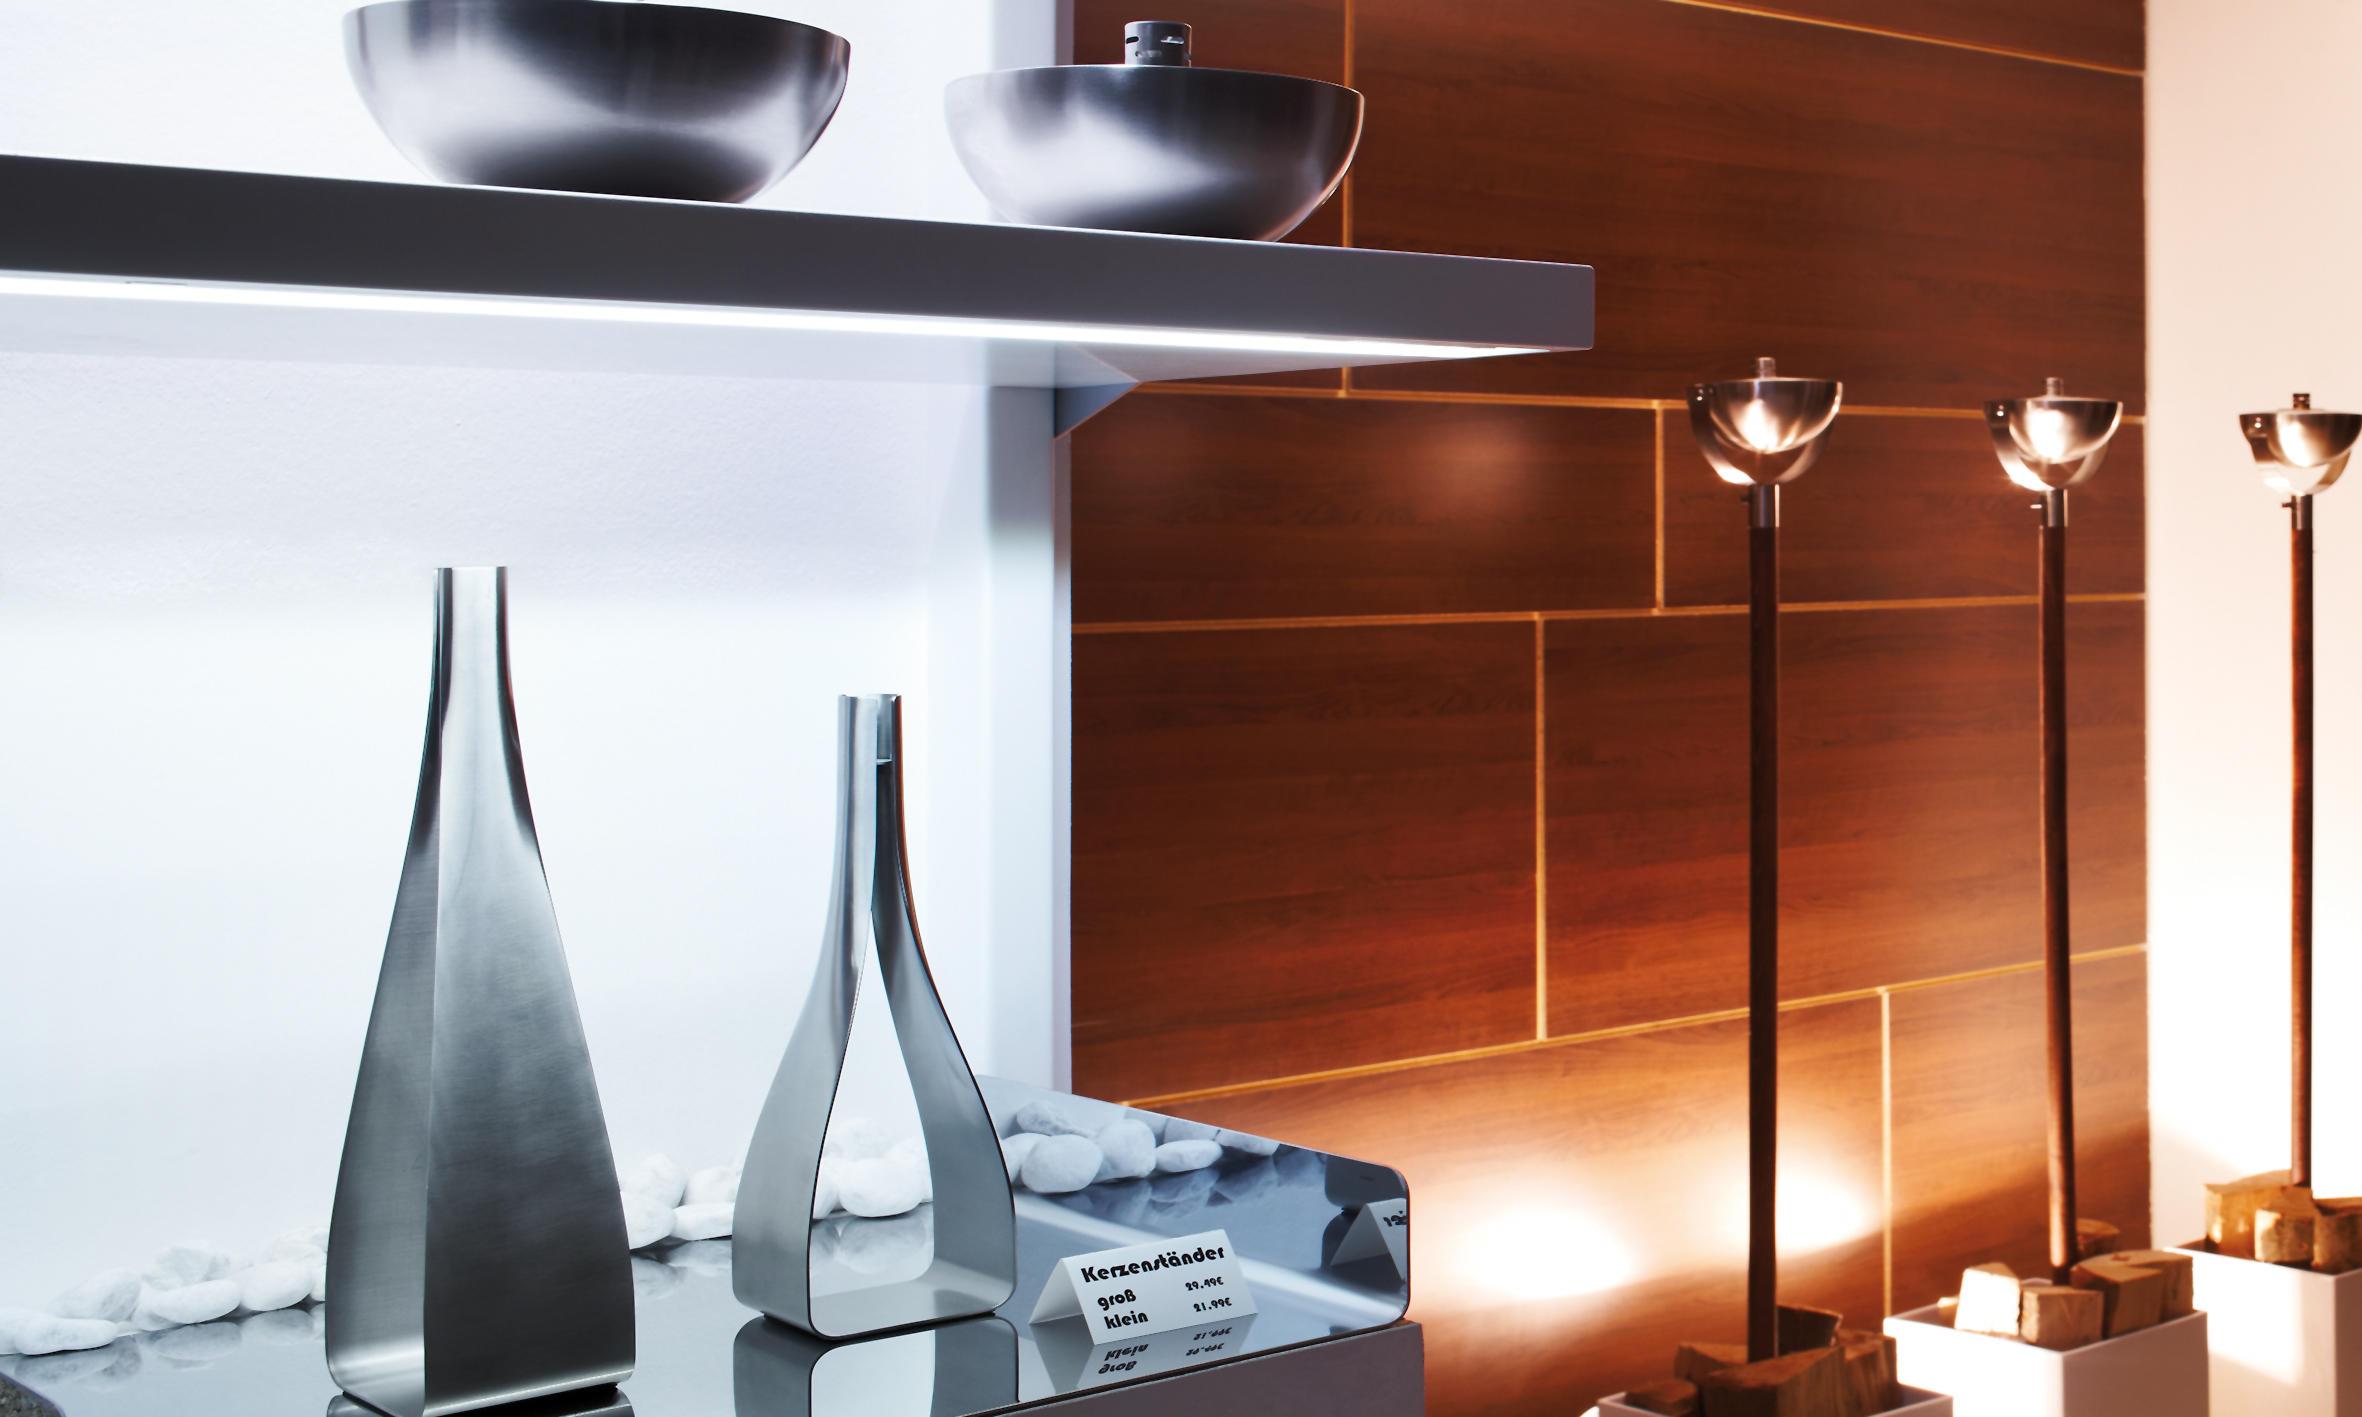 slimlite cs led led lights from hera architonic. Black Bedroom Furniture Sets. Home Design Ideas